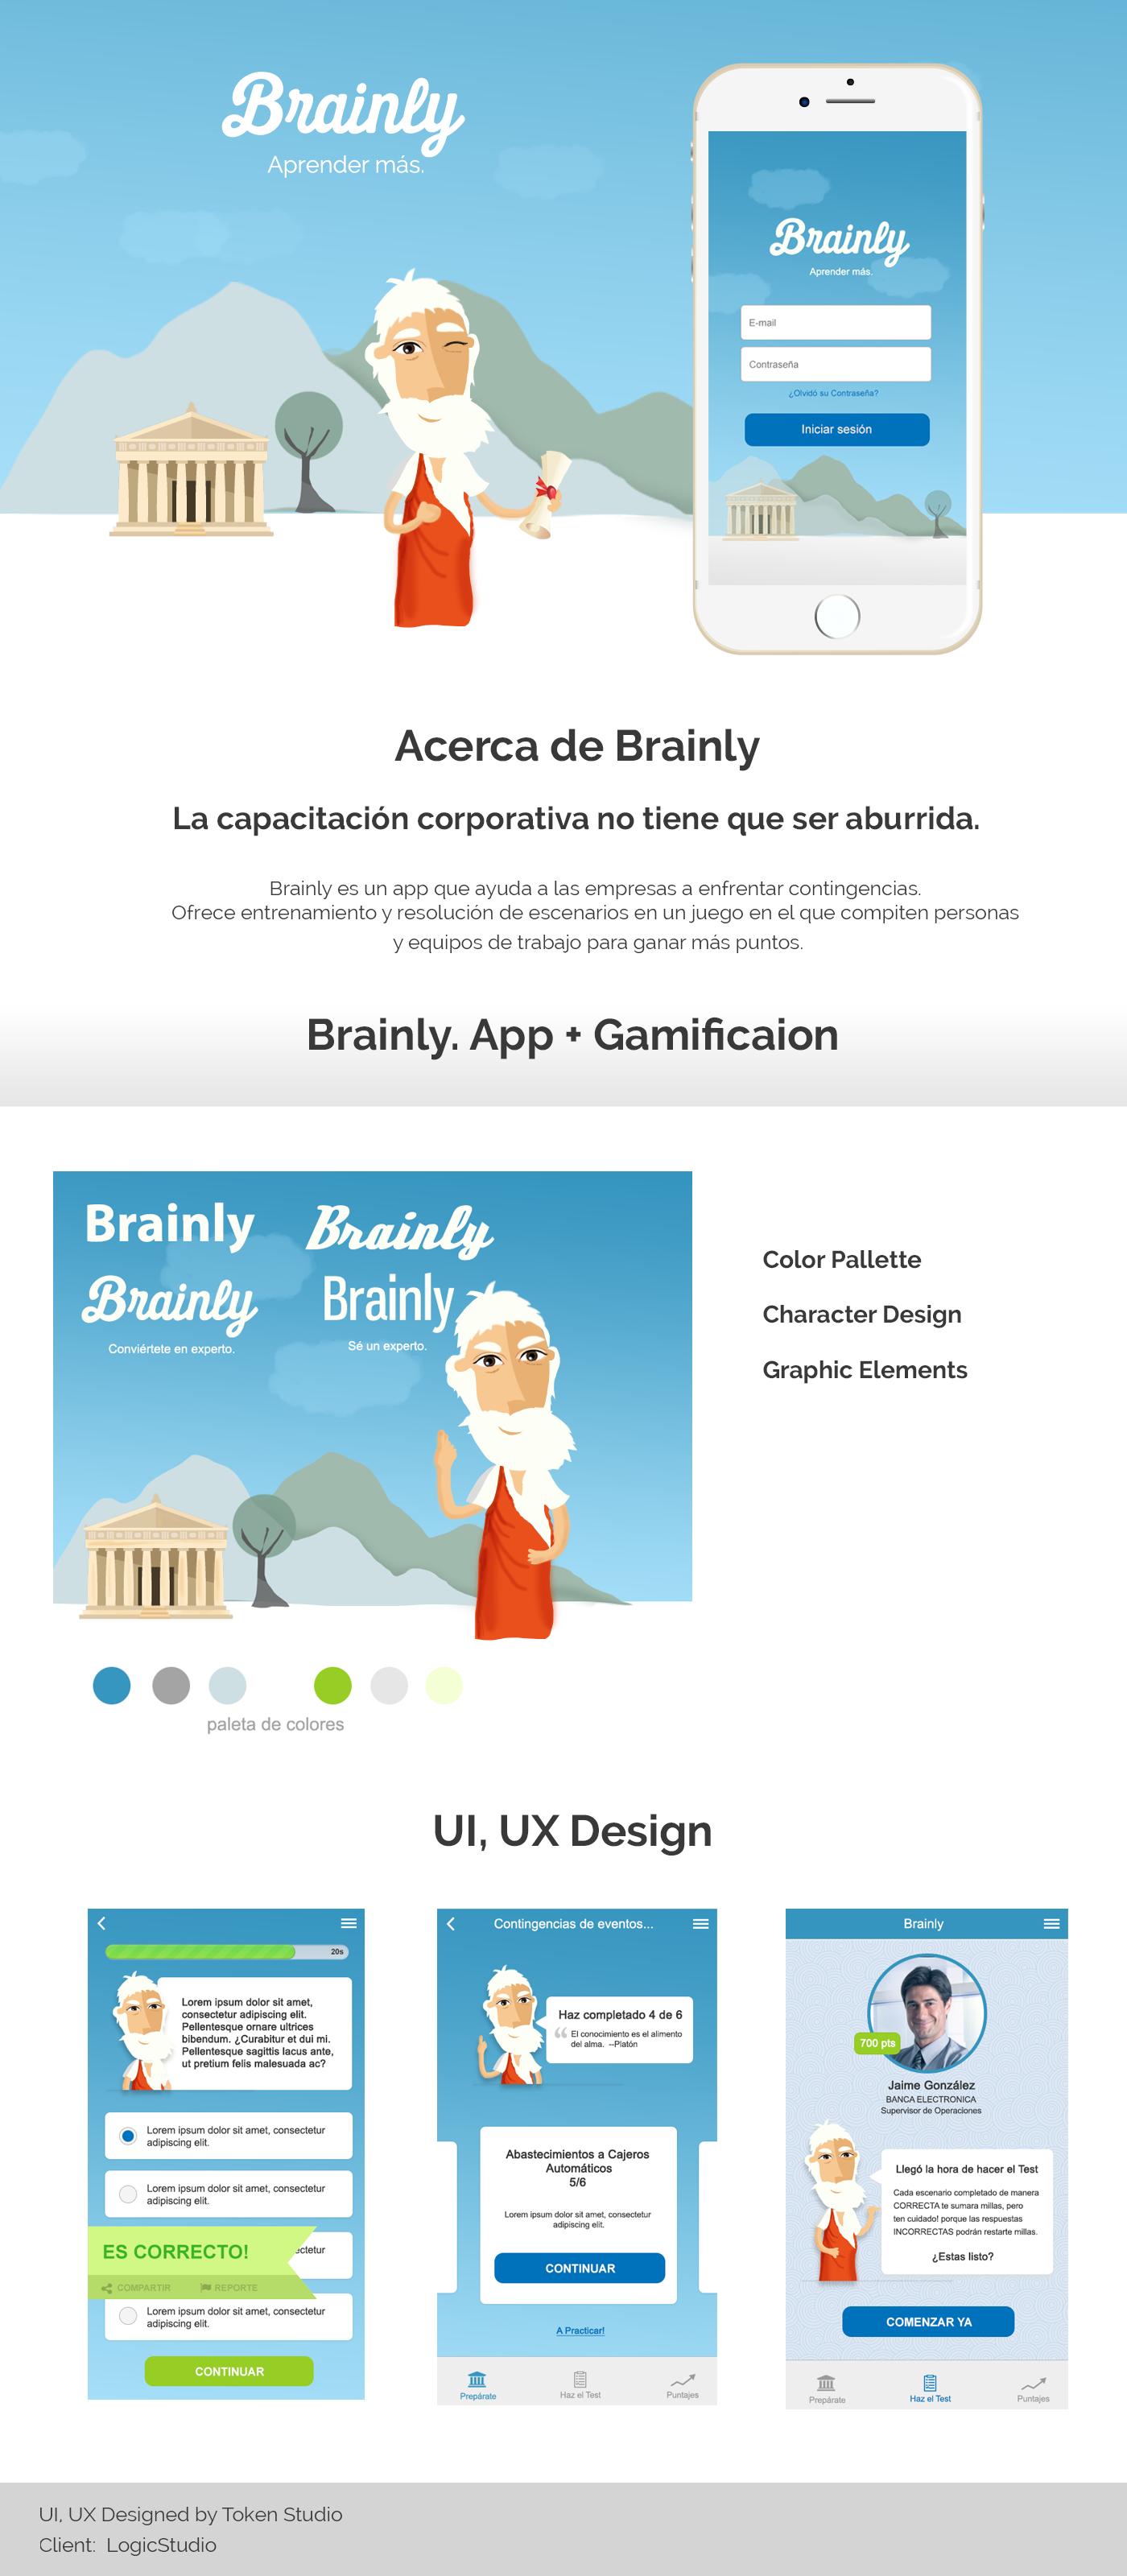 Ui Ux Design Brainly On Behance